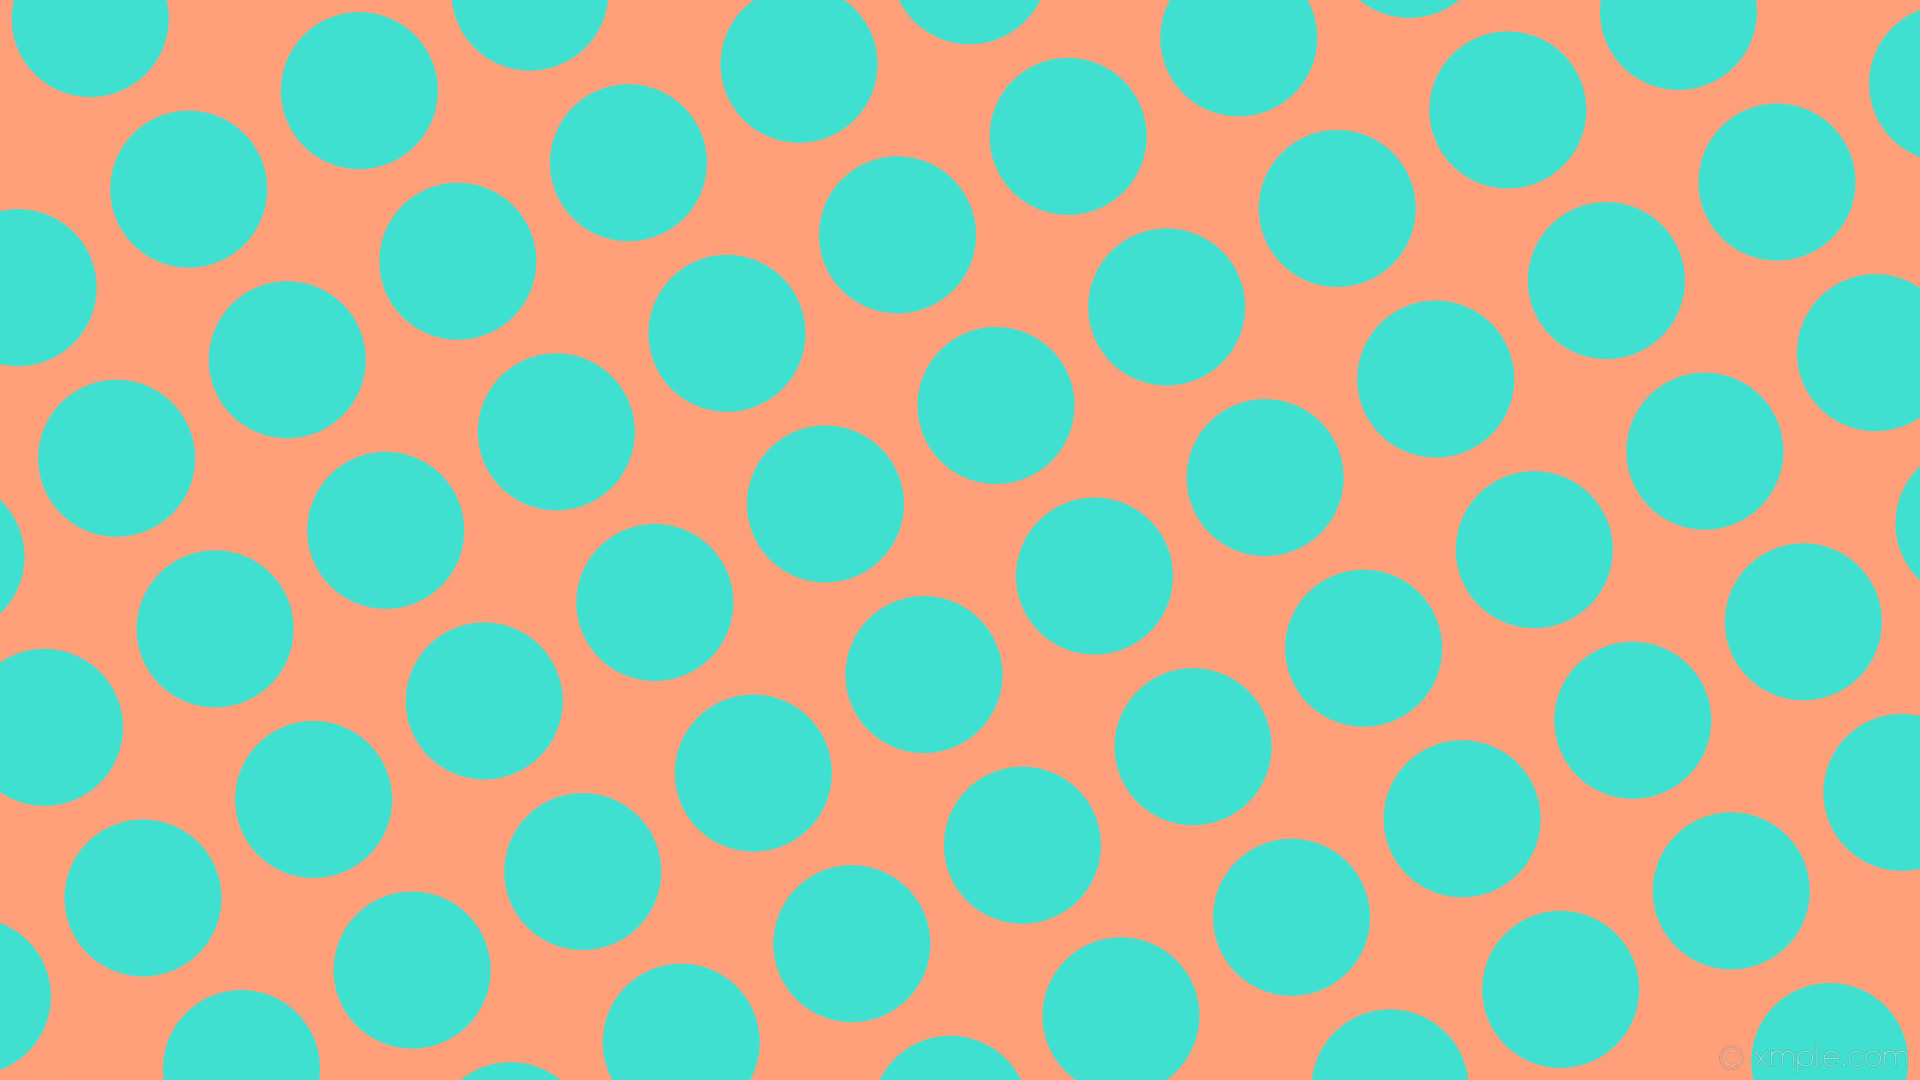 wallpaper spots red polka dots blue light salmon turquoise #ffa07a #40e0d0  210° 157px